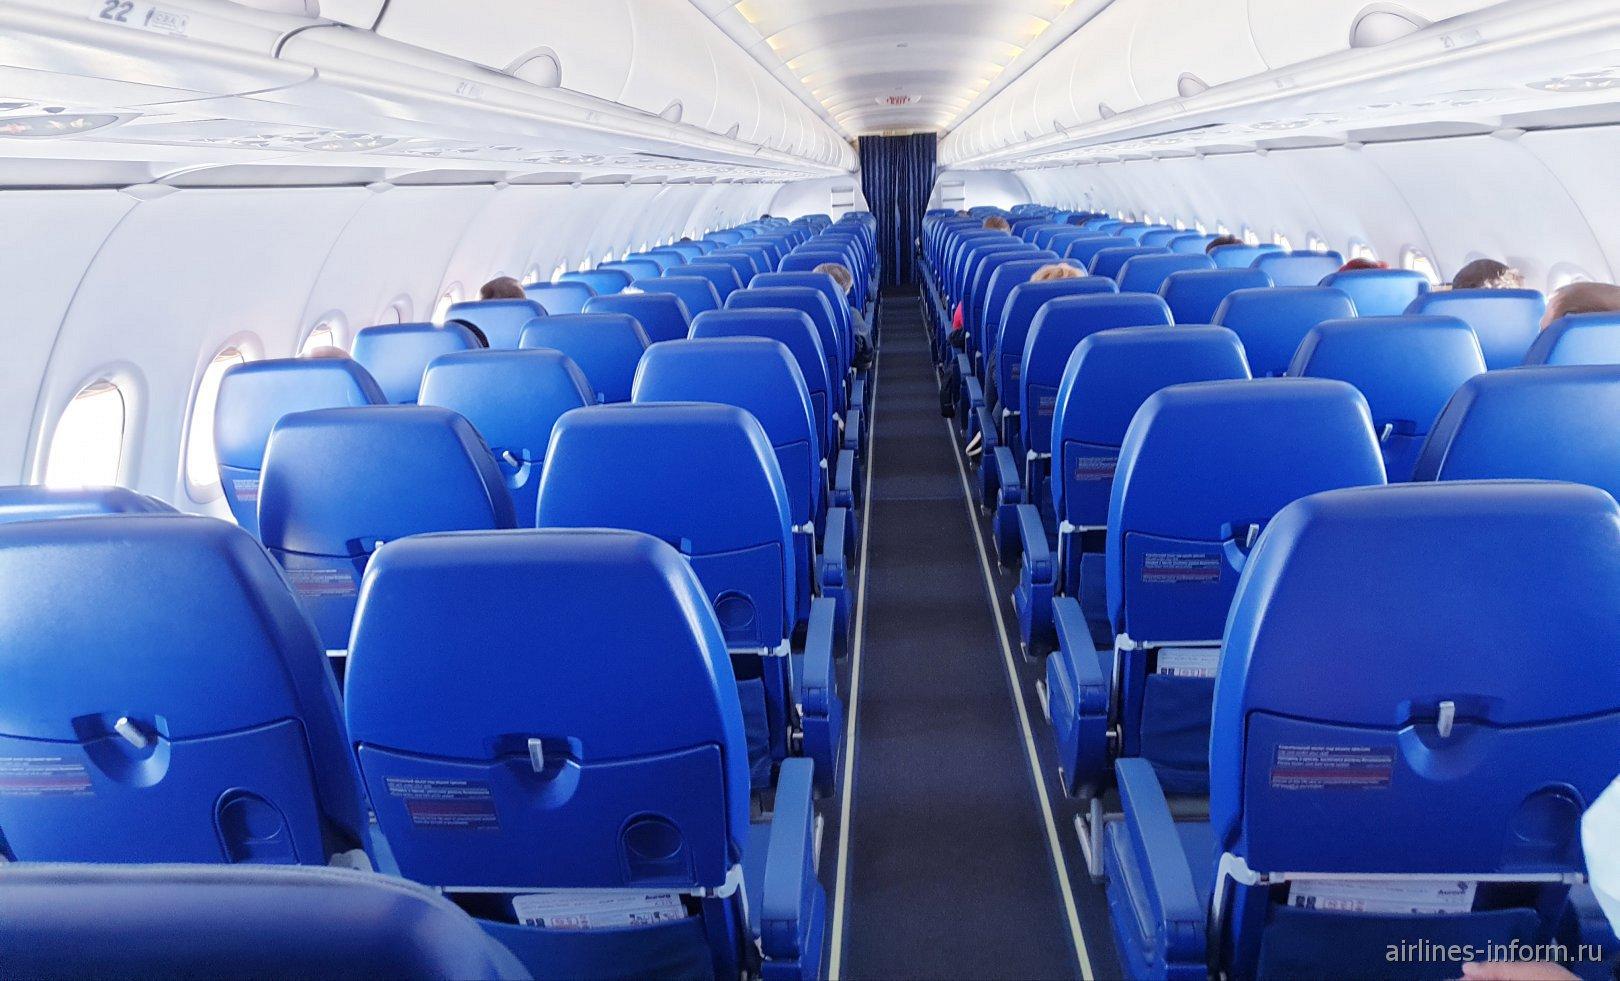 Пассажирский салон самолета Airbus A319 авиакомпании